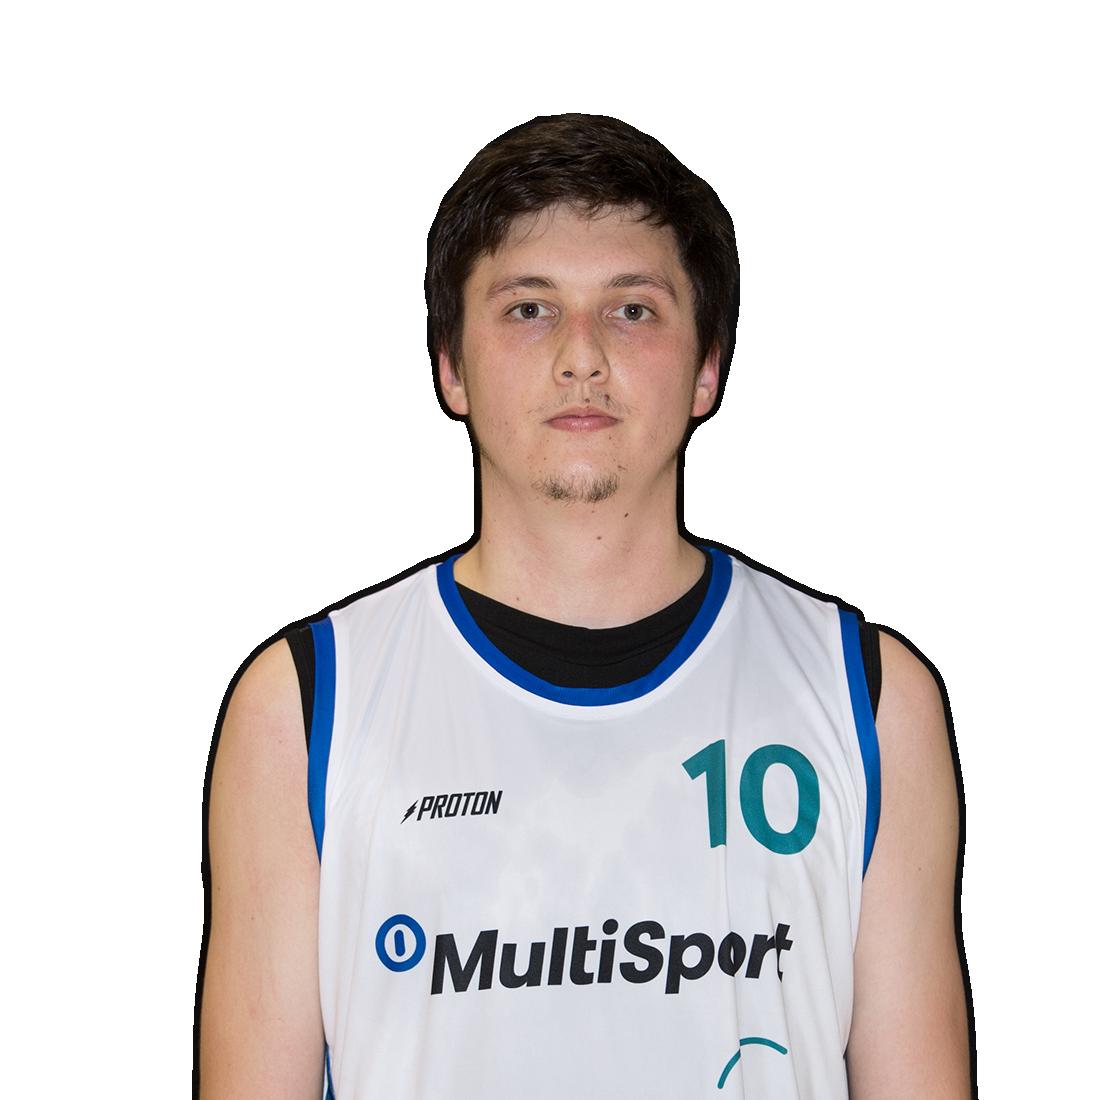 Piotr Mystowski